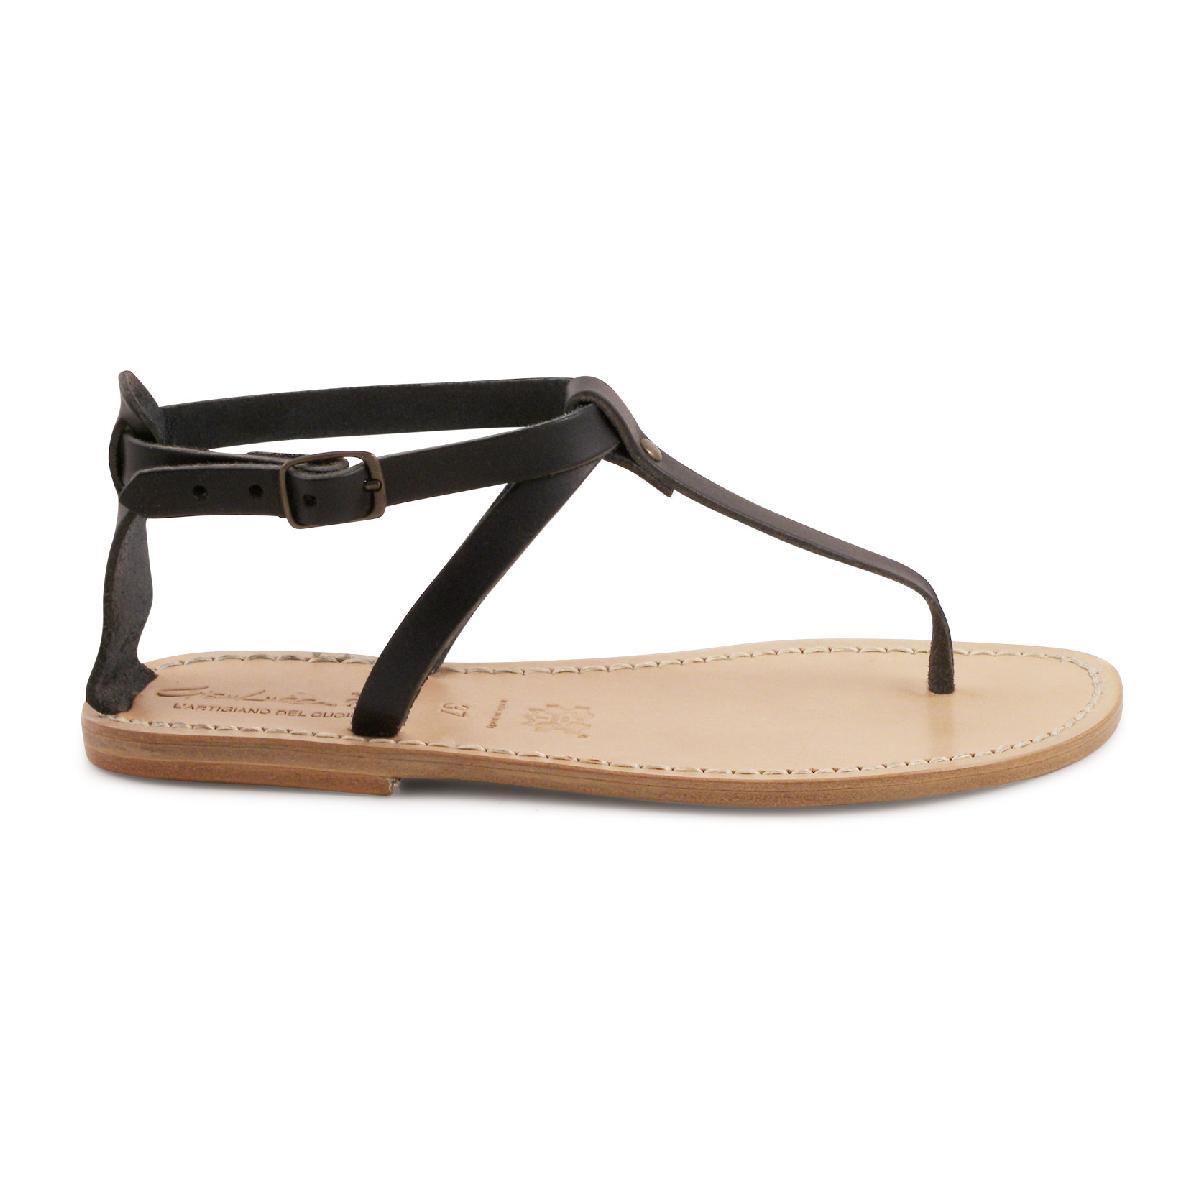 sandale tong en cuir noir artisanales pour femme. Black Bedroom Furniture Sets. Home Design Ideas